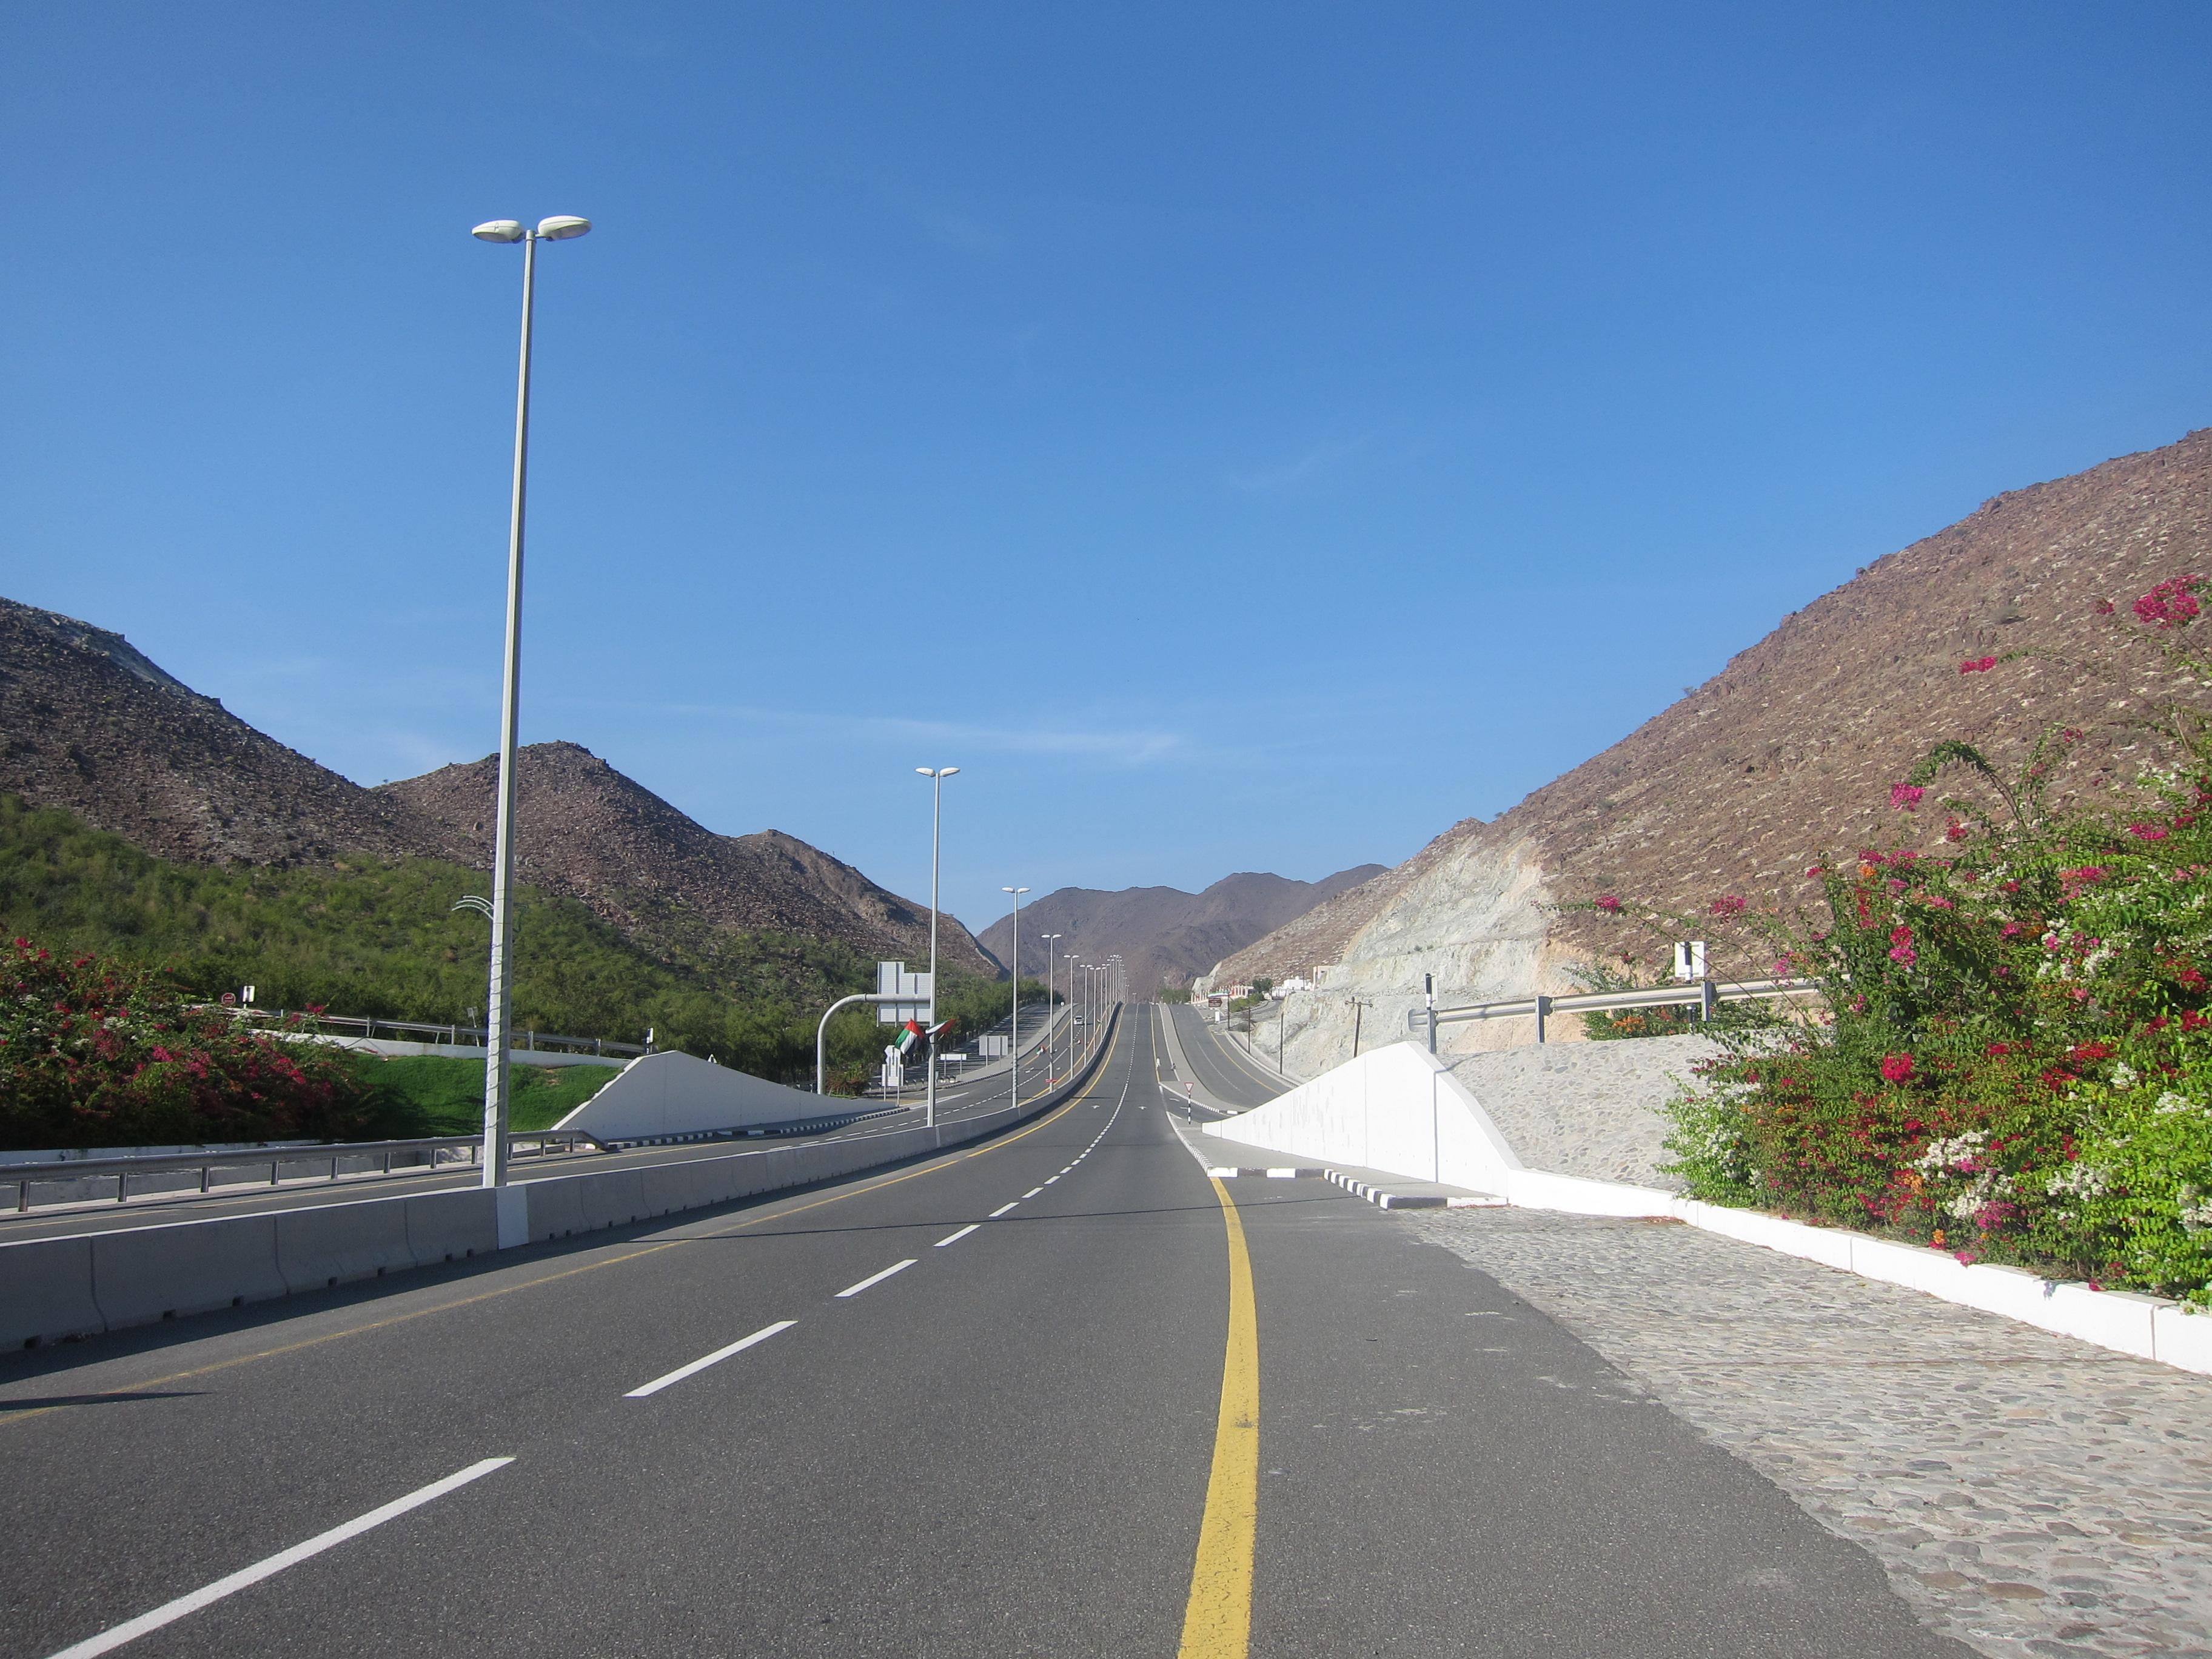 File:Sharjah-Kalba Road ഷാർജ-കൽബ റോഡ് 05.JPG - Wikimedia Commons